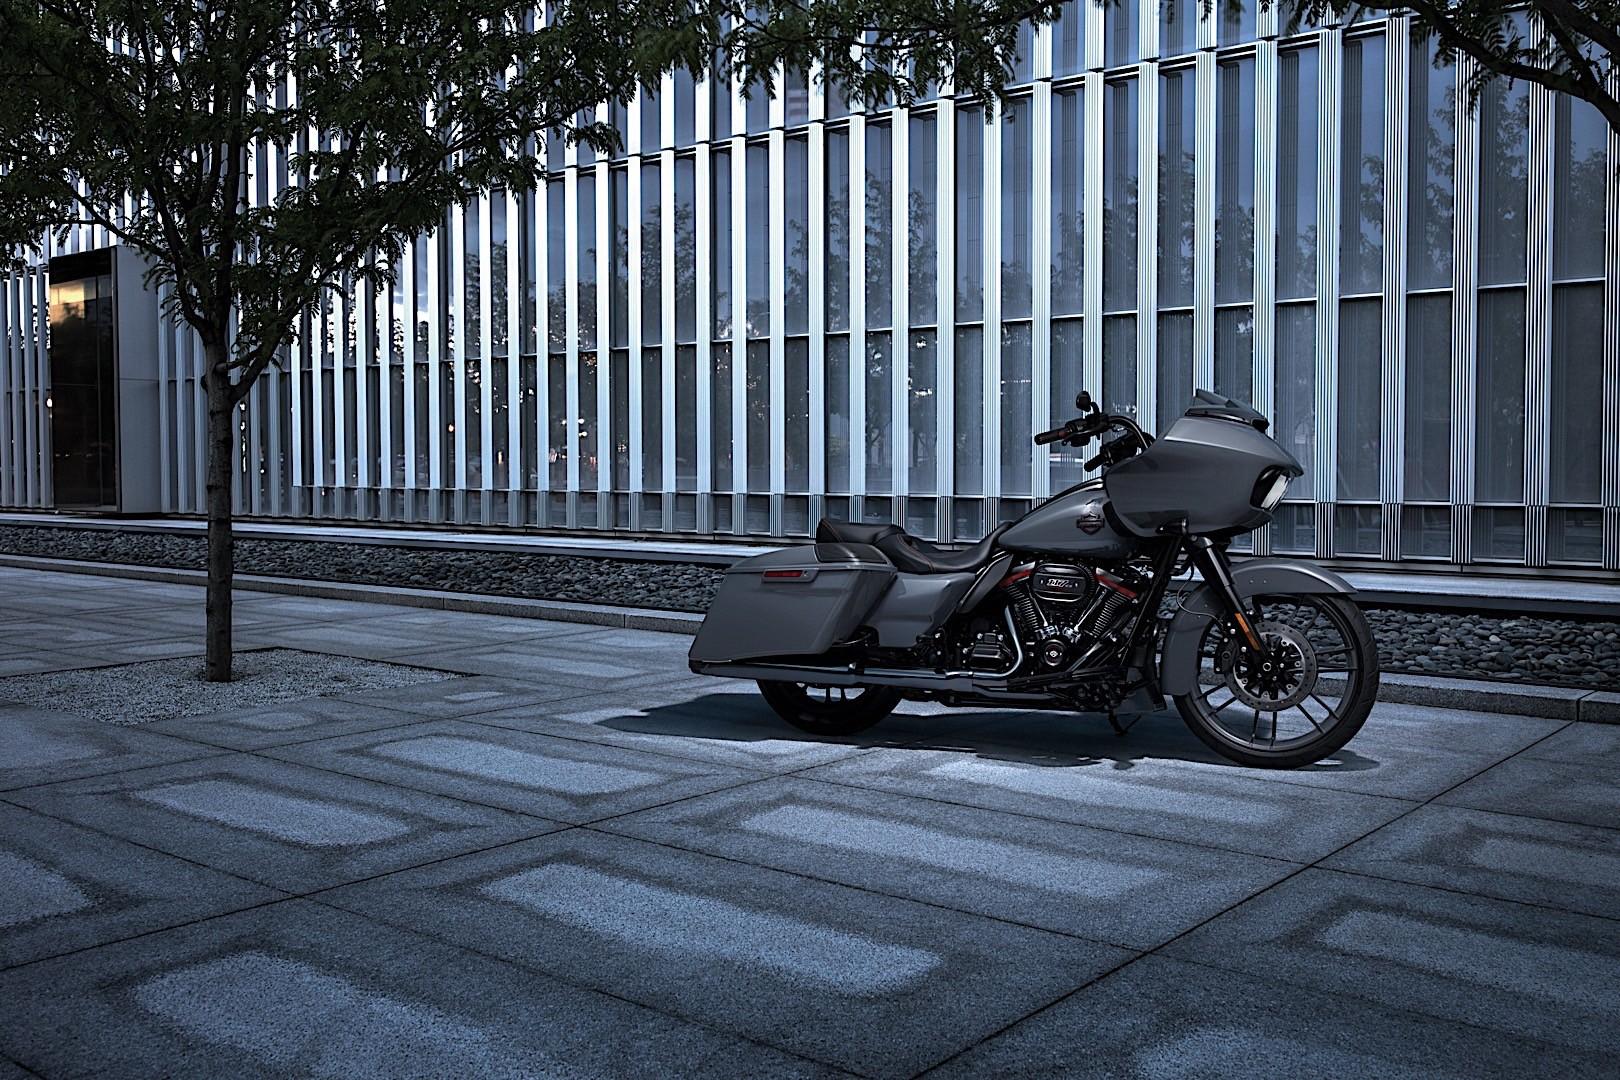 Three CVO Models Added to 2018 Harley-Davidson Lineup ...